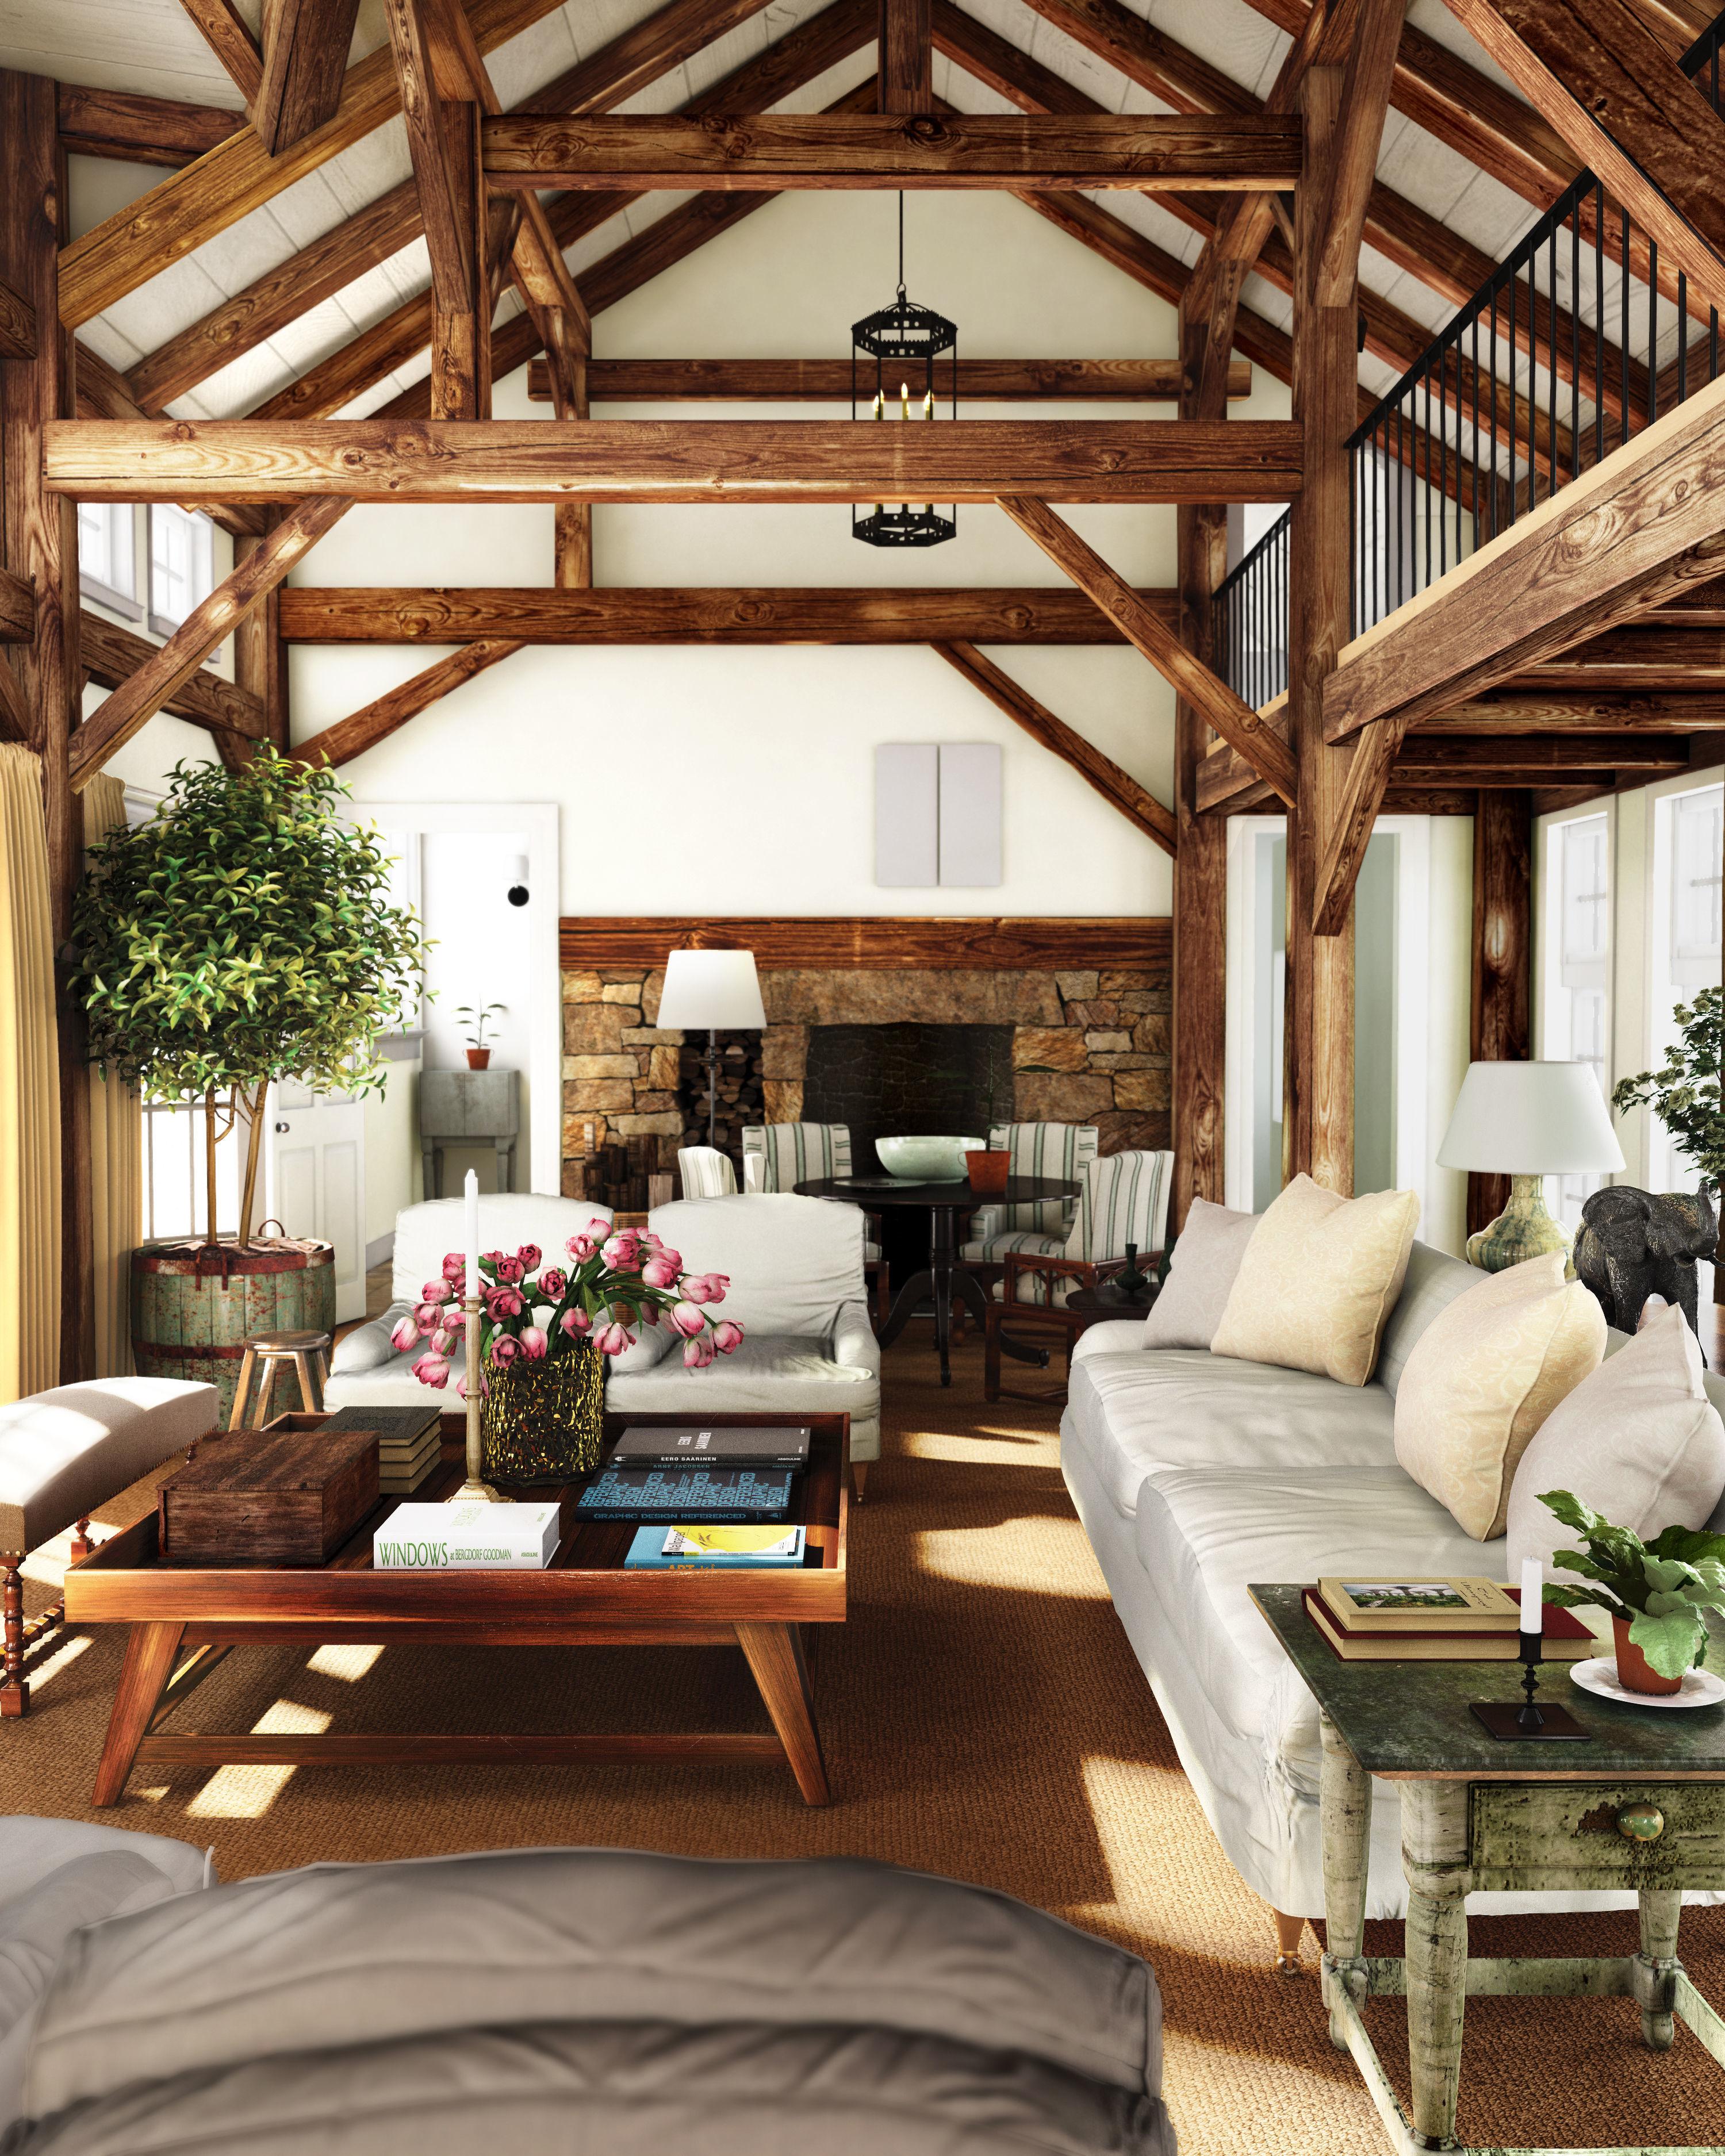 Big Cozy Living Room: Cozy Rustic Countryside Living Room Big Wood House 3D 1